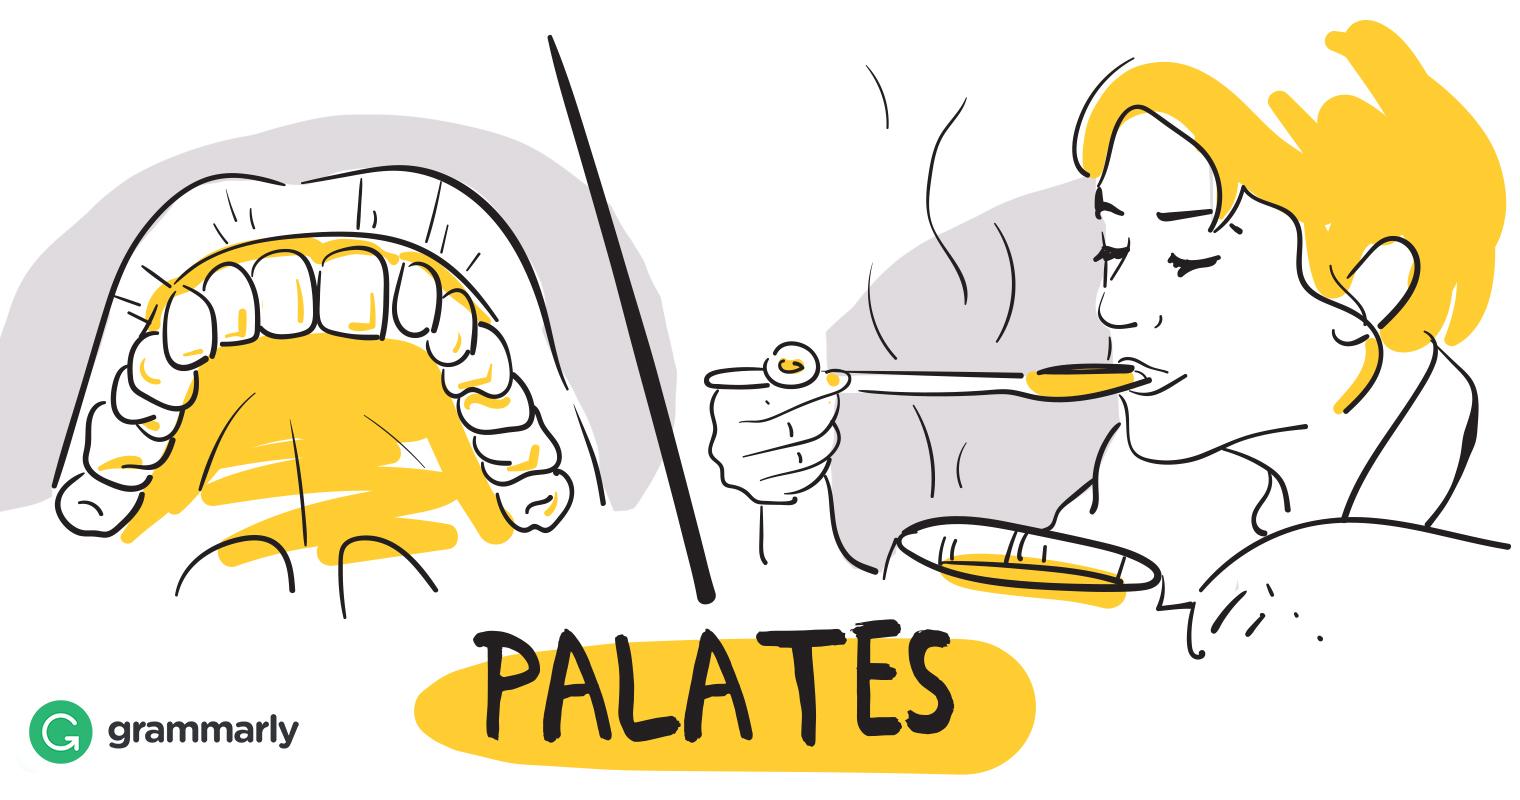 PALATES